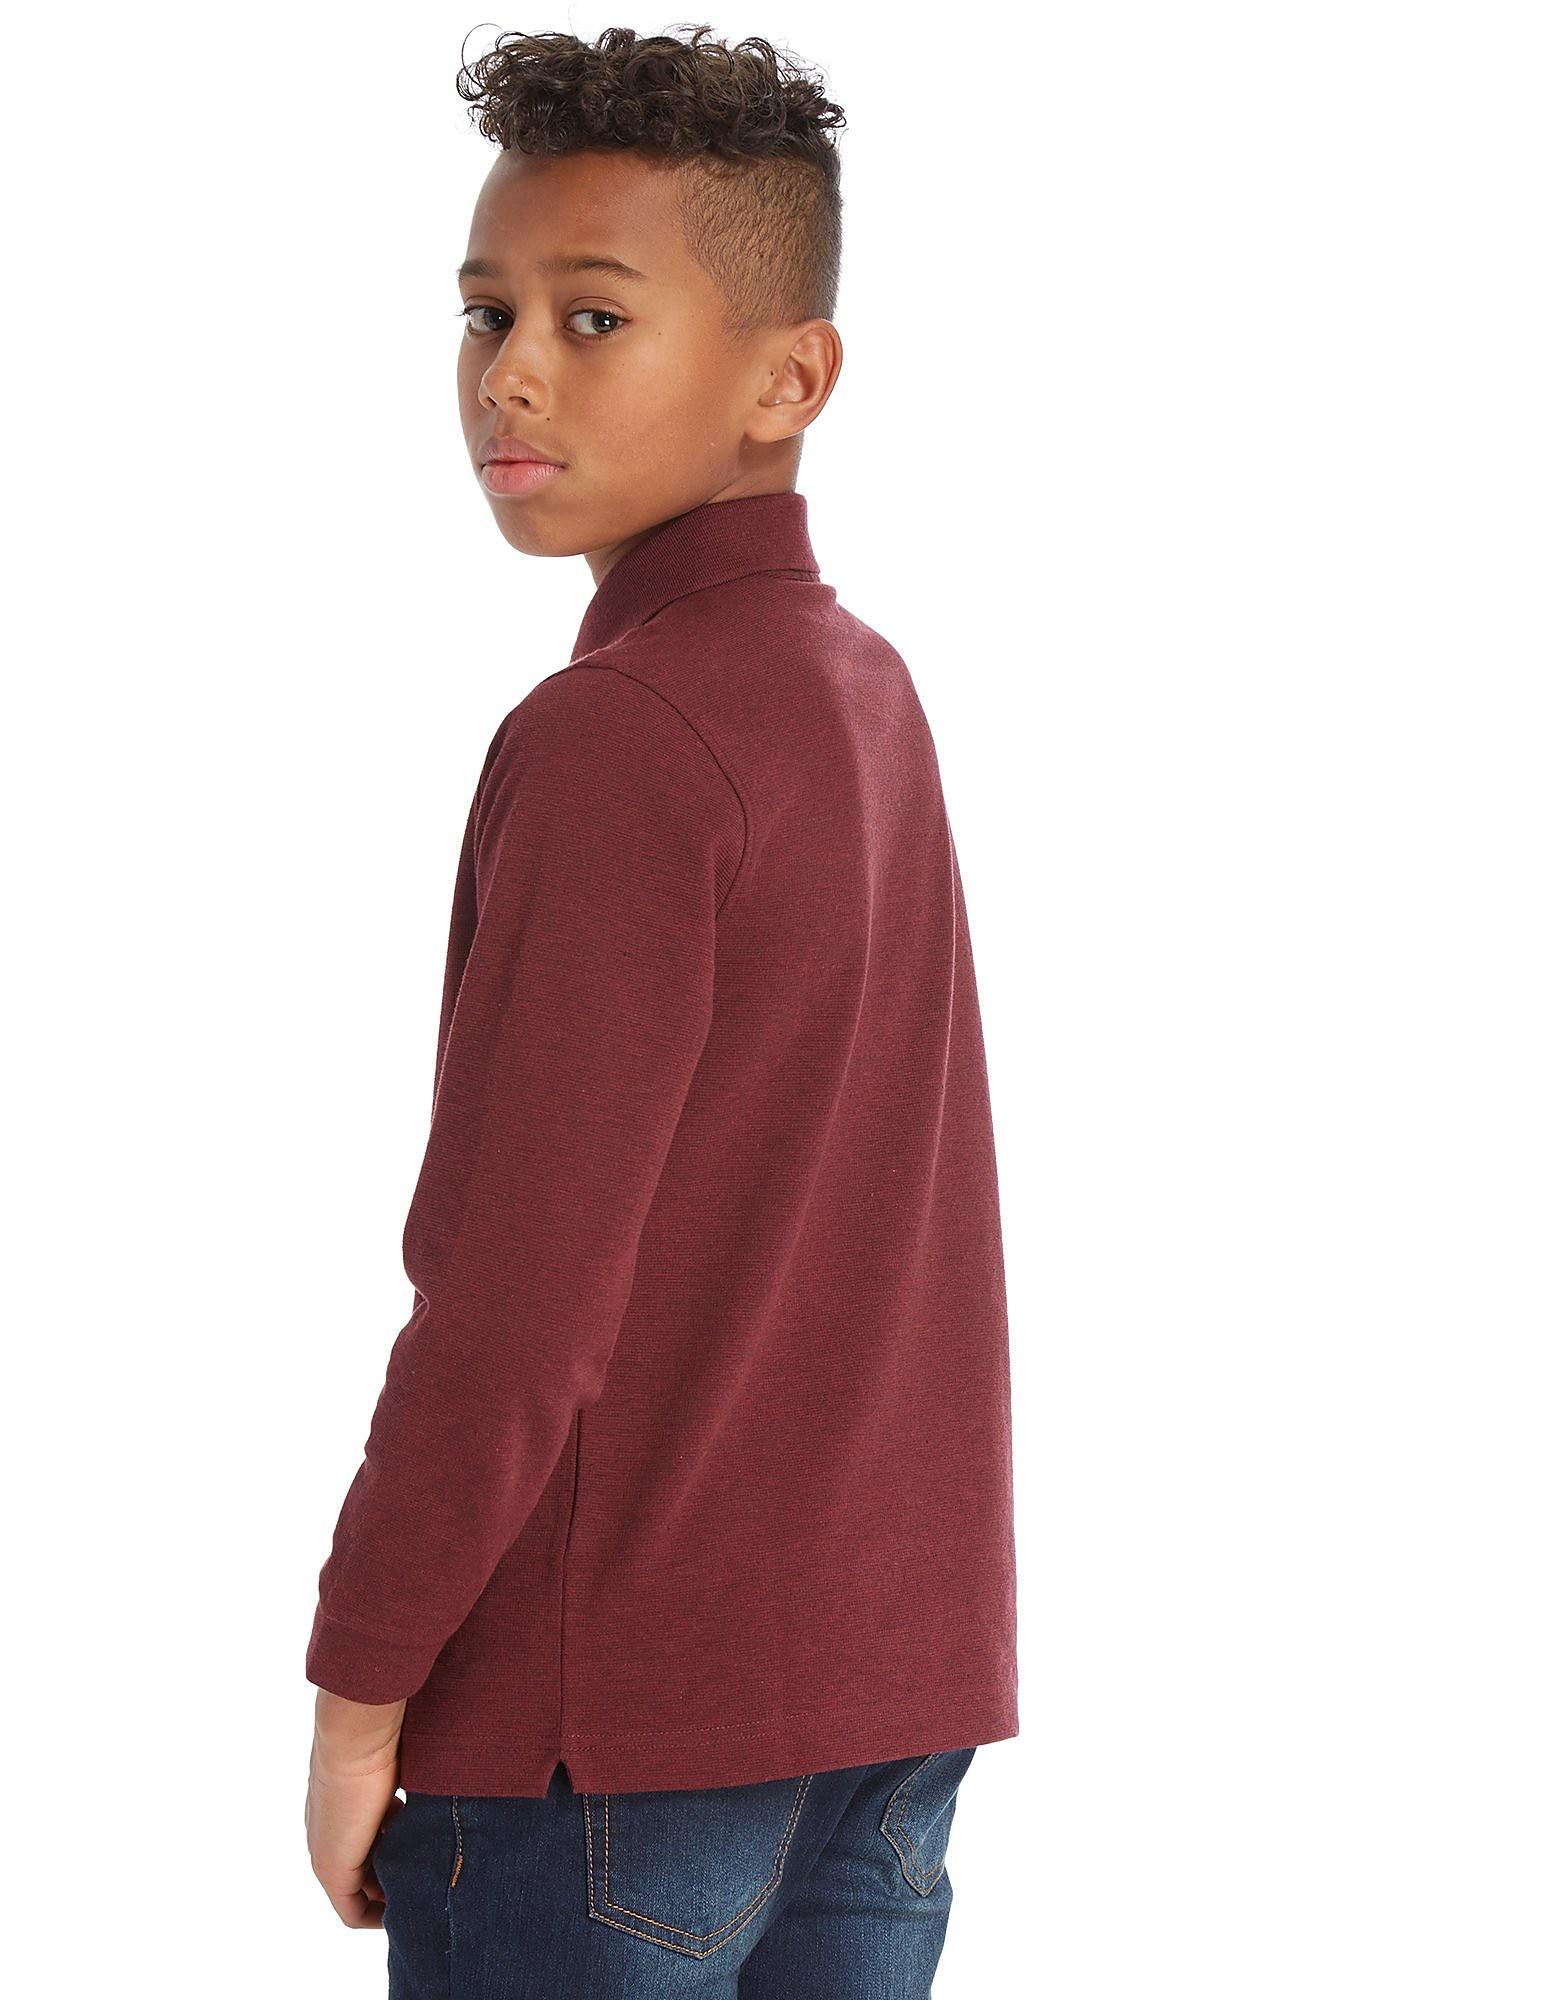 Lacoste Long Sleeve Sport Polo T-Shirt Children